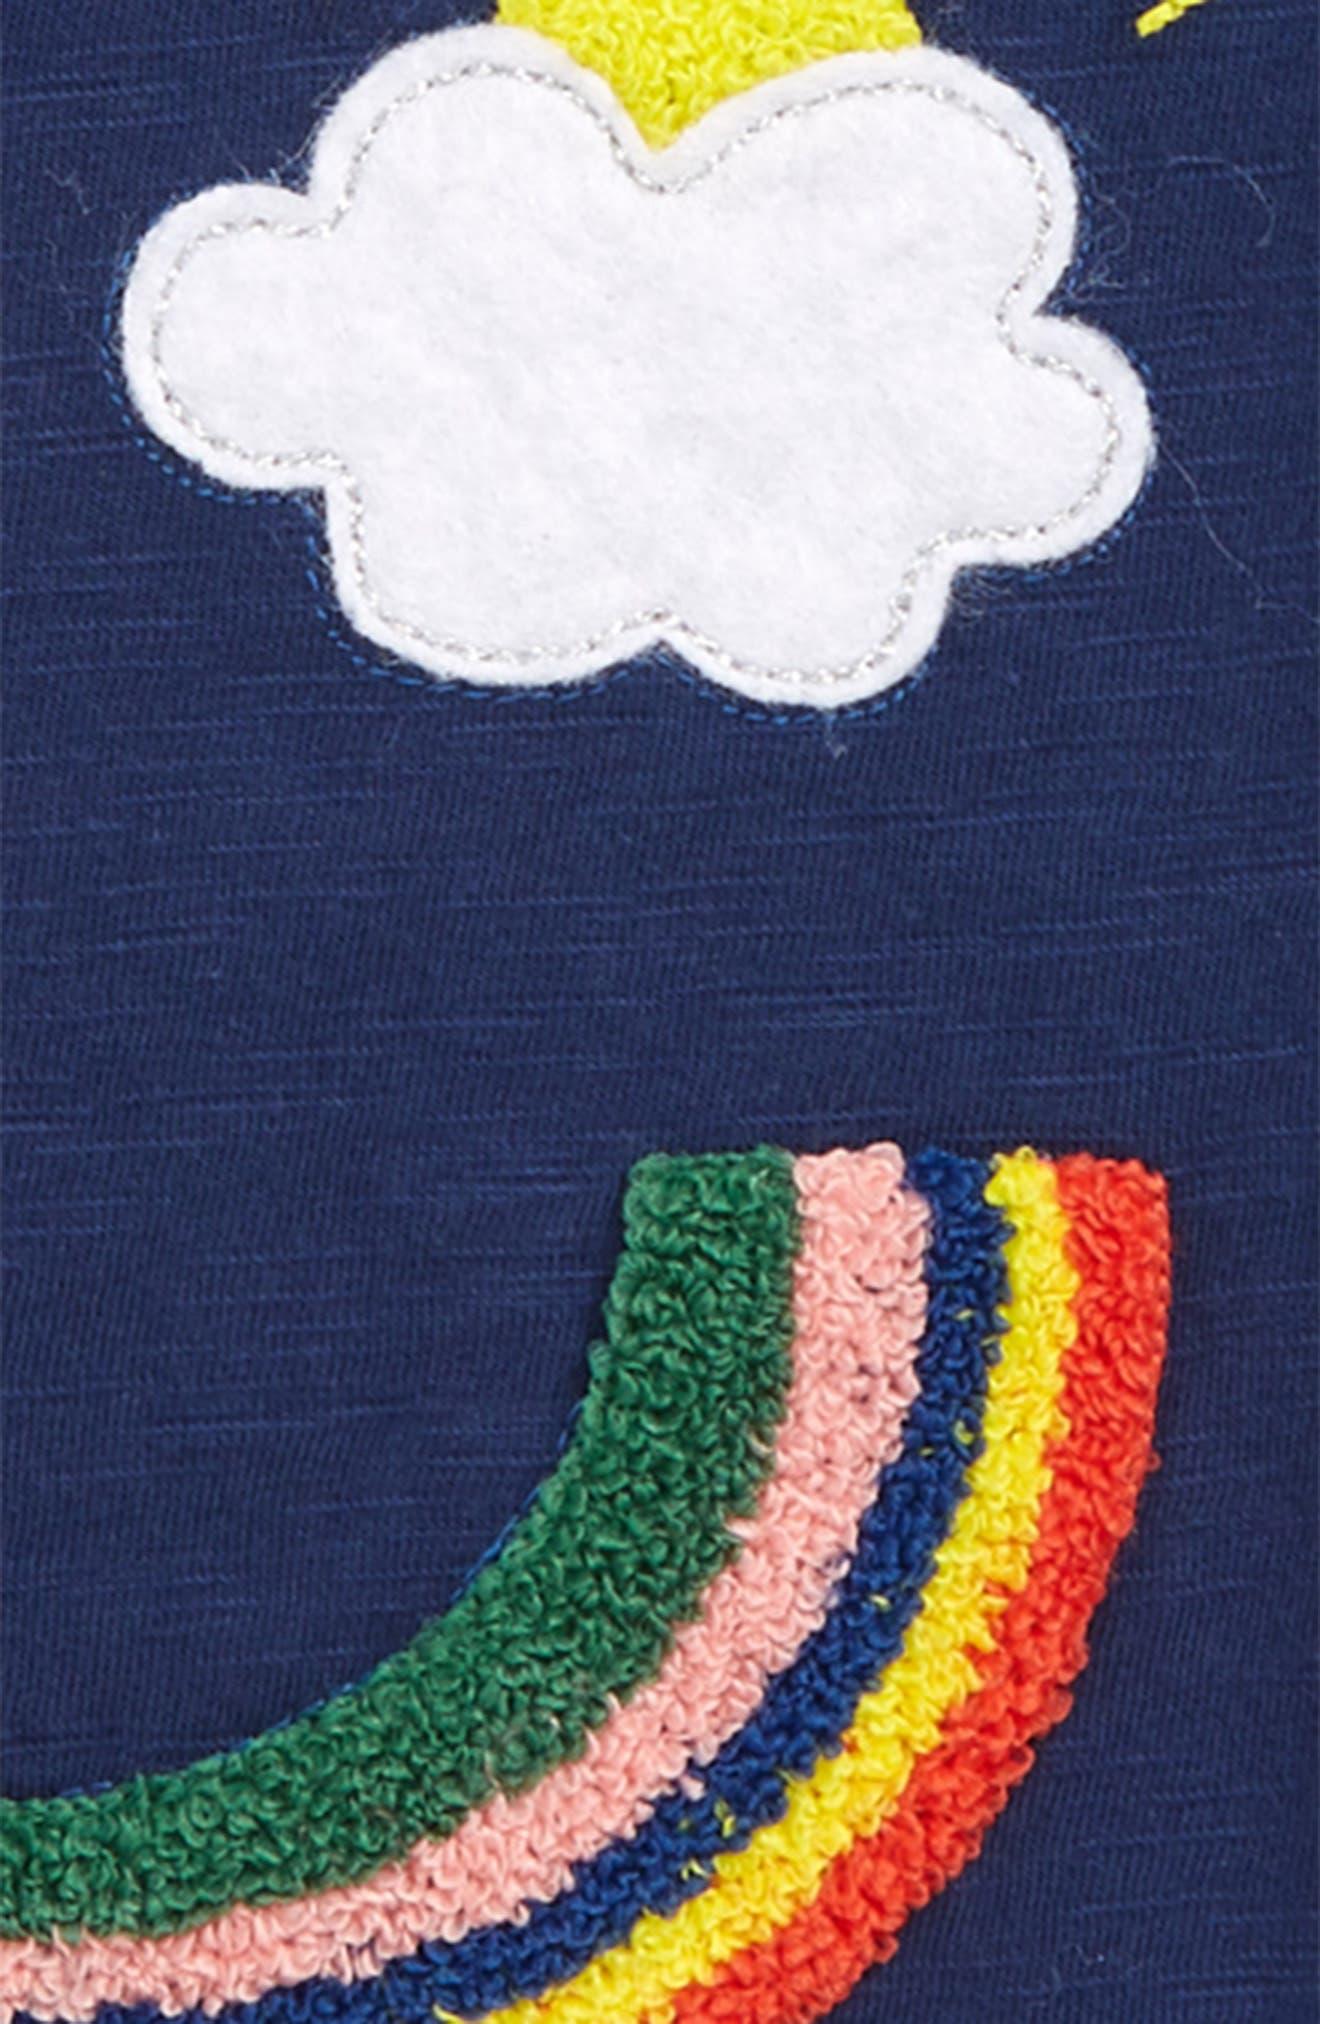 Rainbow Appliqué Tee,                             Alternate thumbnail 2, color,                             NAV COLLEGE BLUE FACE